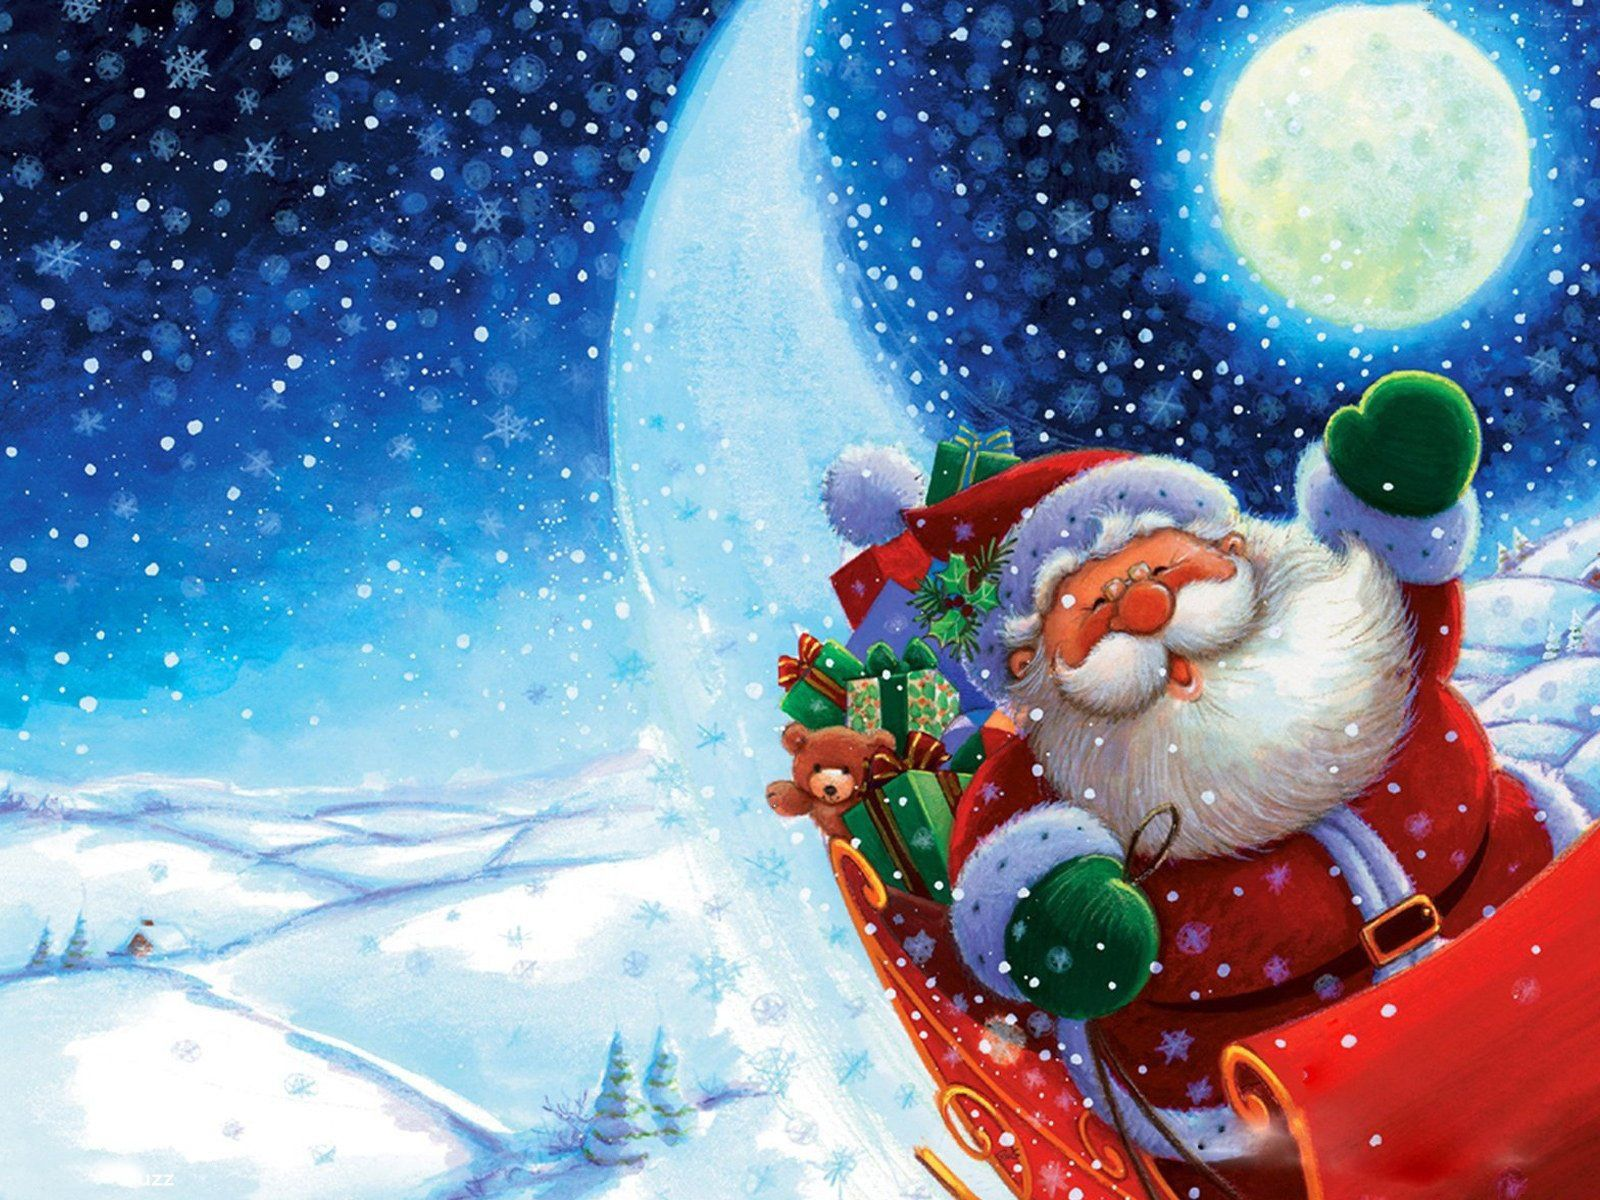 Pin By Deborah Hines On Holidays Funny Christmas Wallpaper Santa Claus Wallpaper Santa Claus Pictures